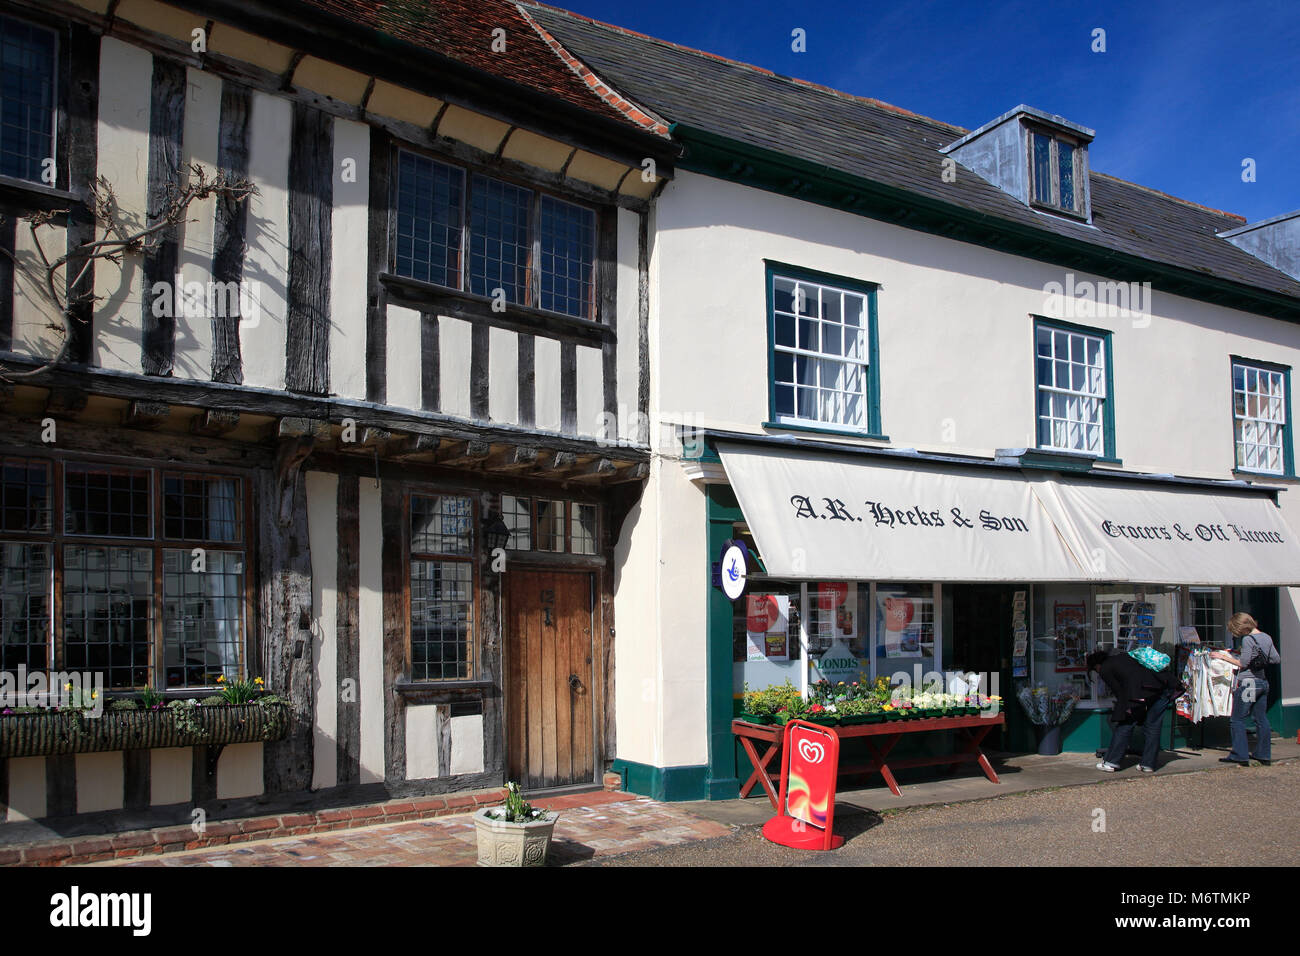 Shops along the high street, Lavenham village, Suffolk County, England, UK - Stock Image